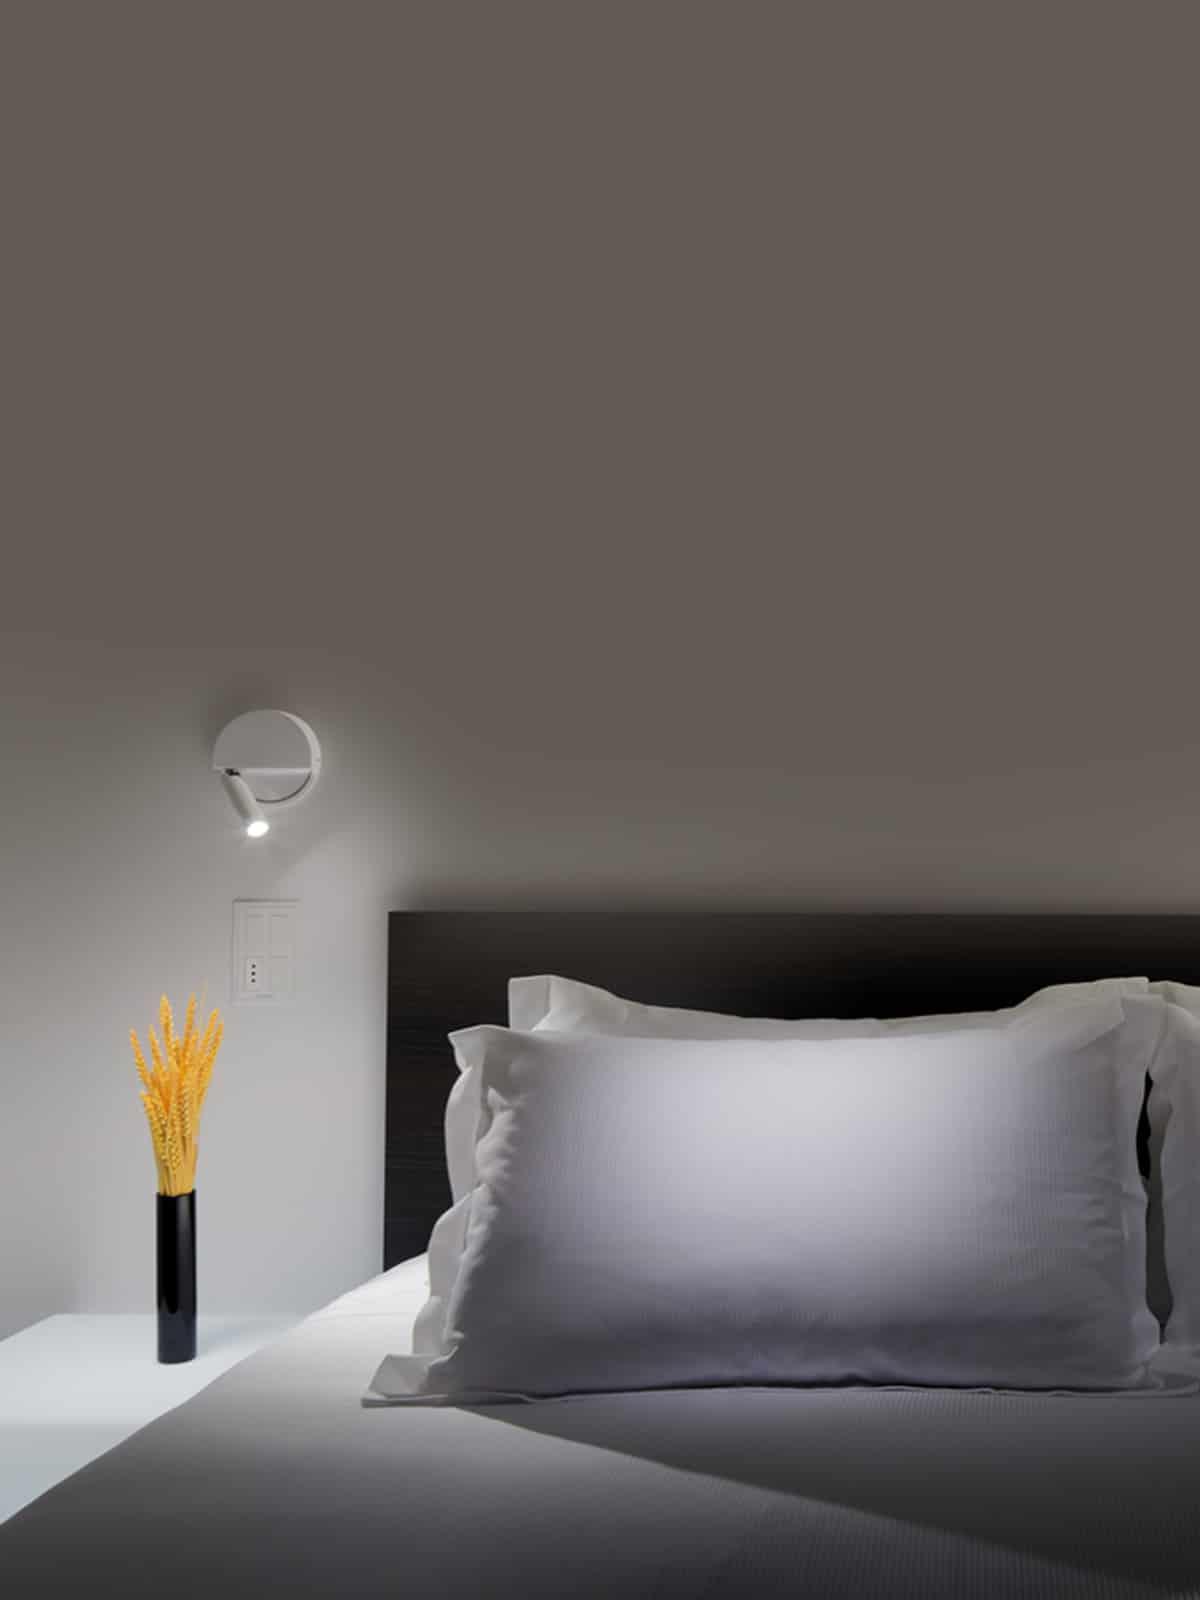 LEDTUBE R weiss links neben Bett